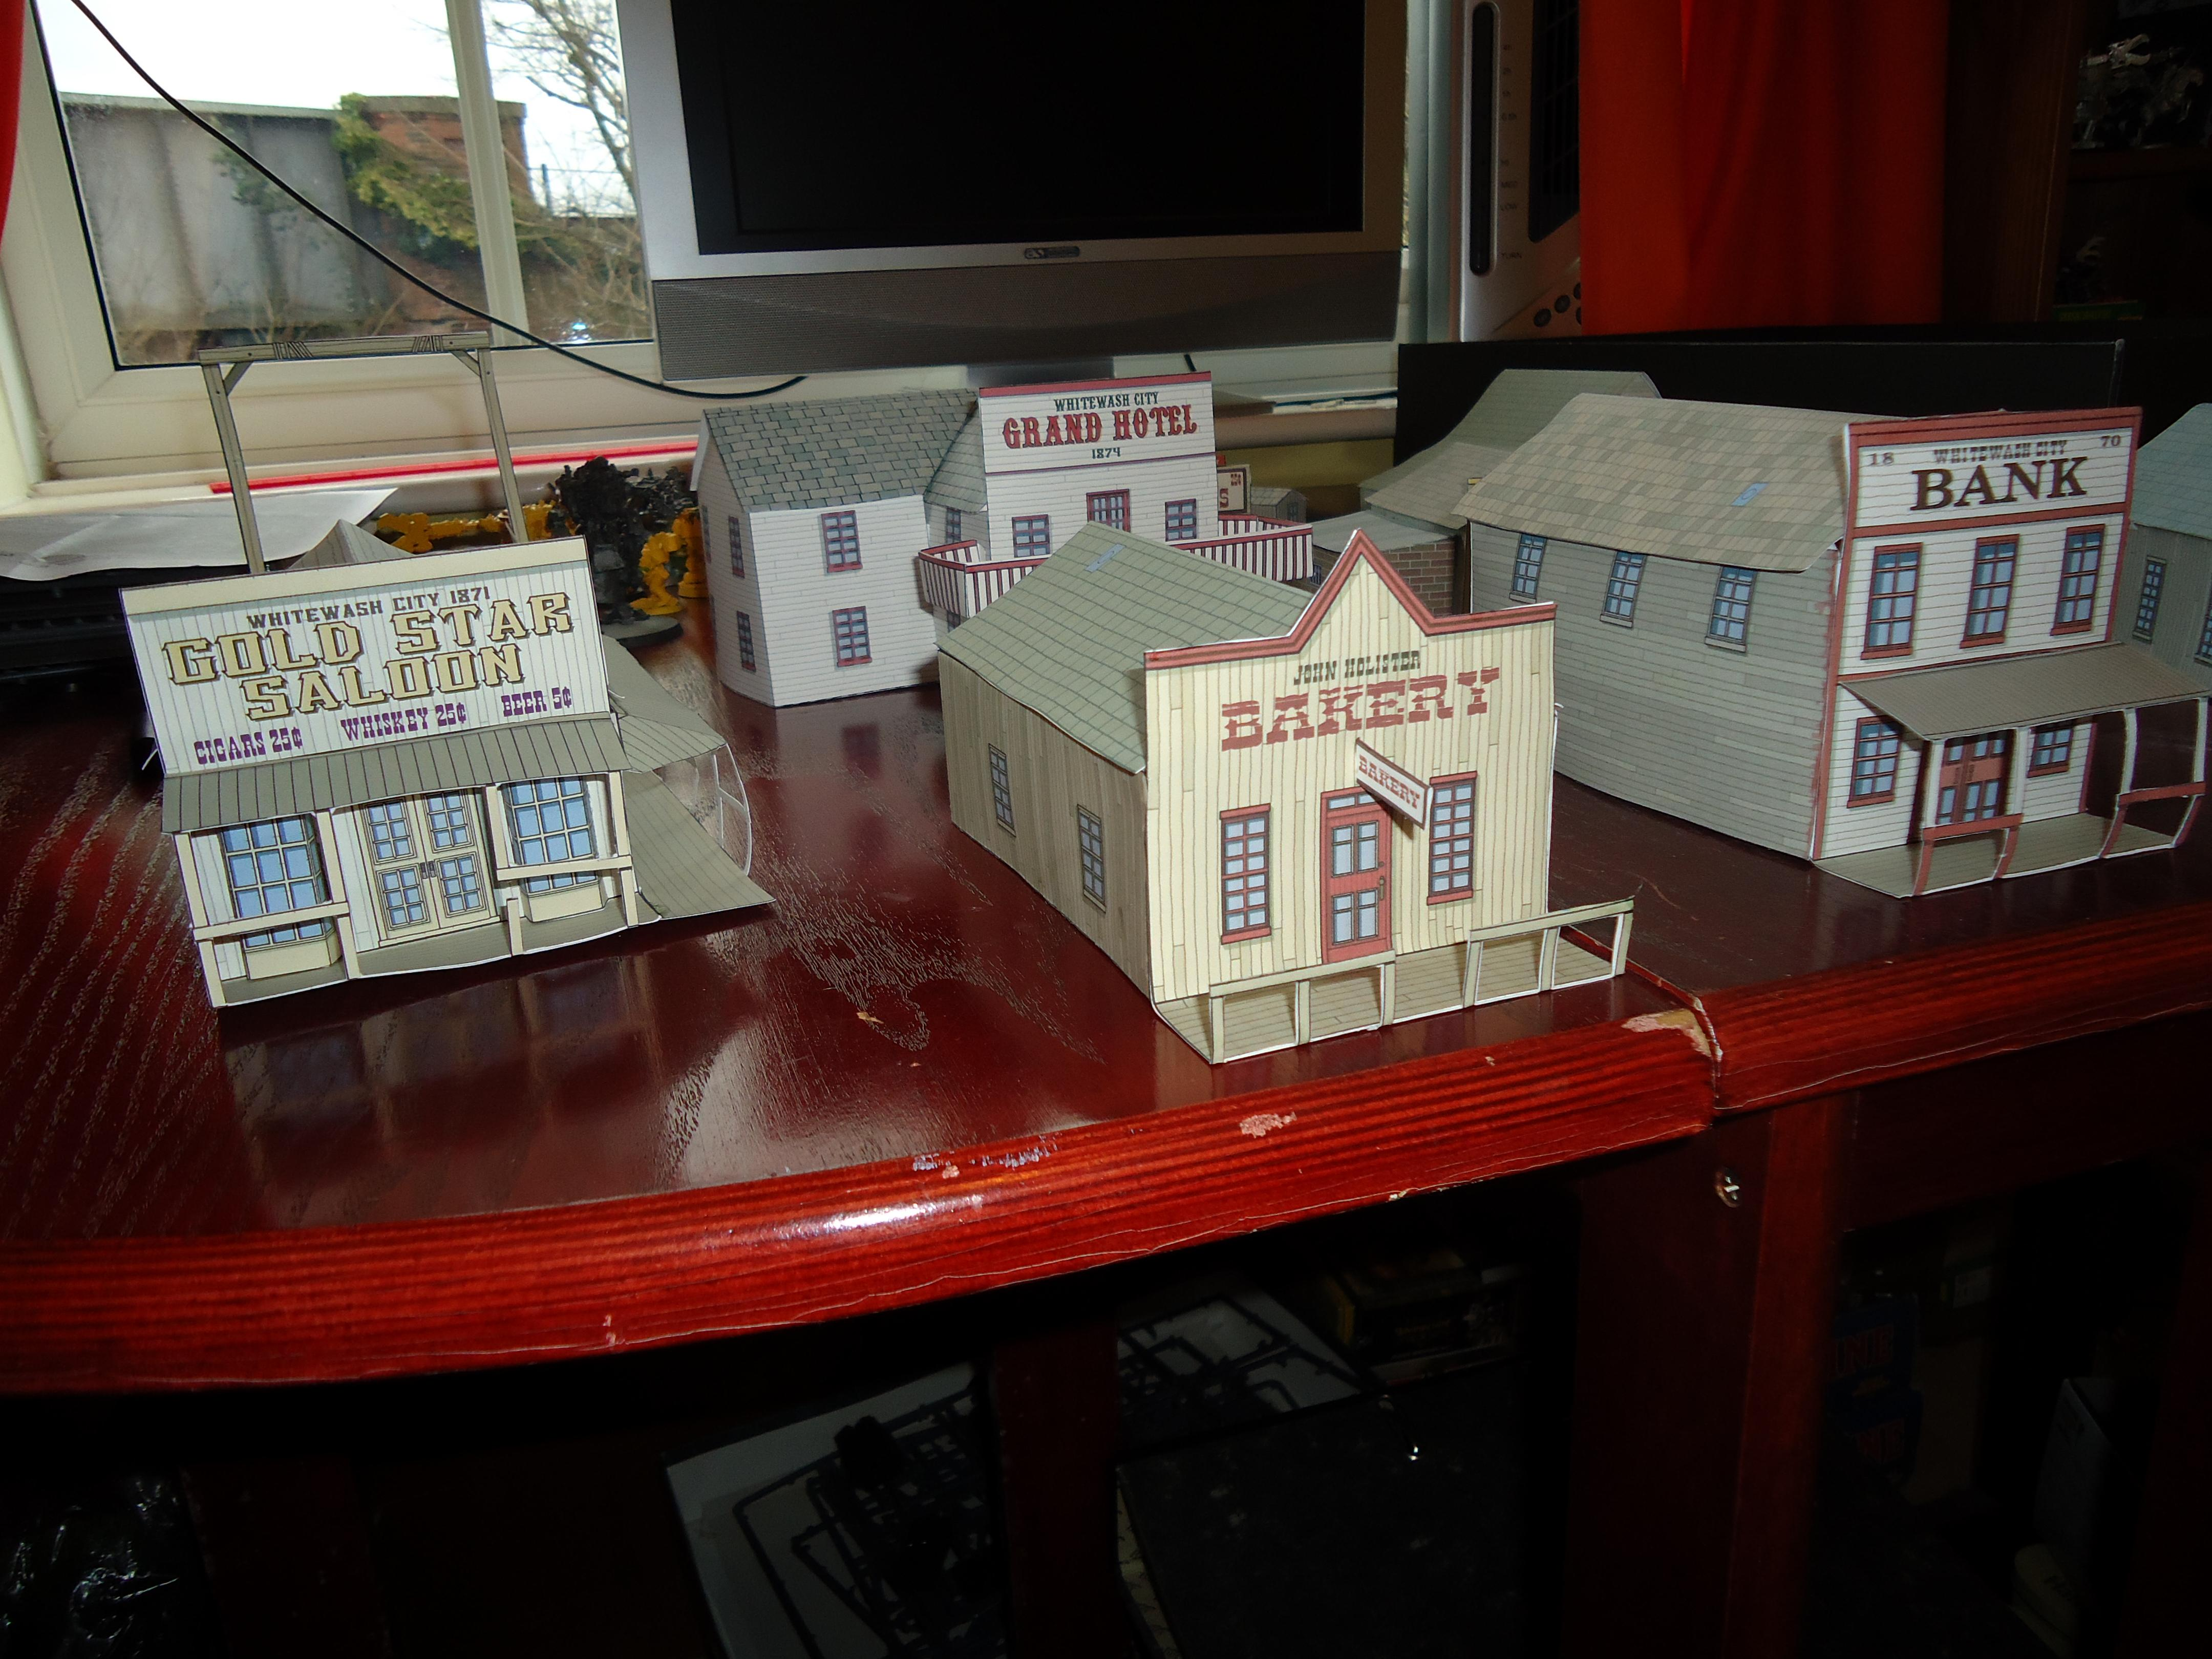 Whitewash City Papercraft 1